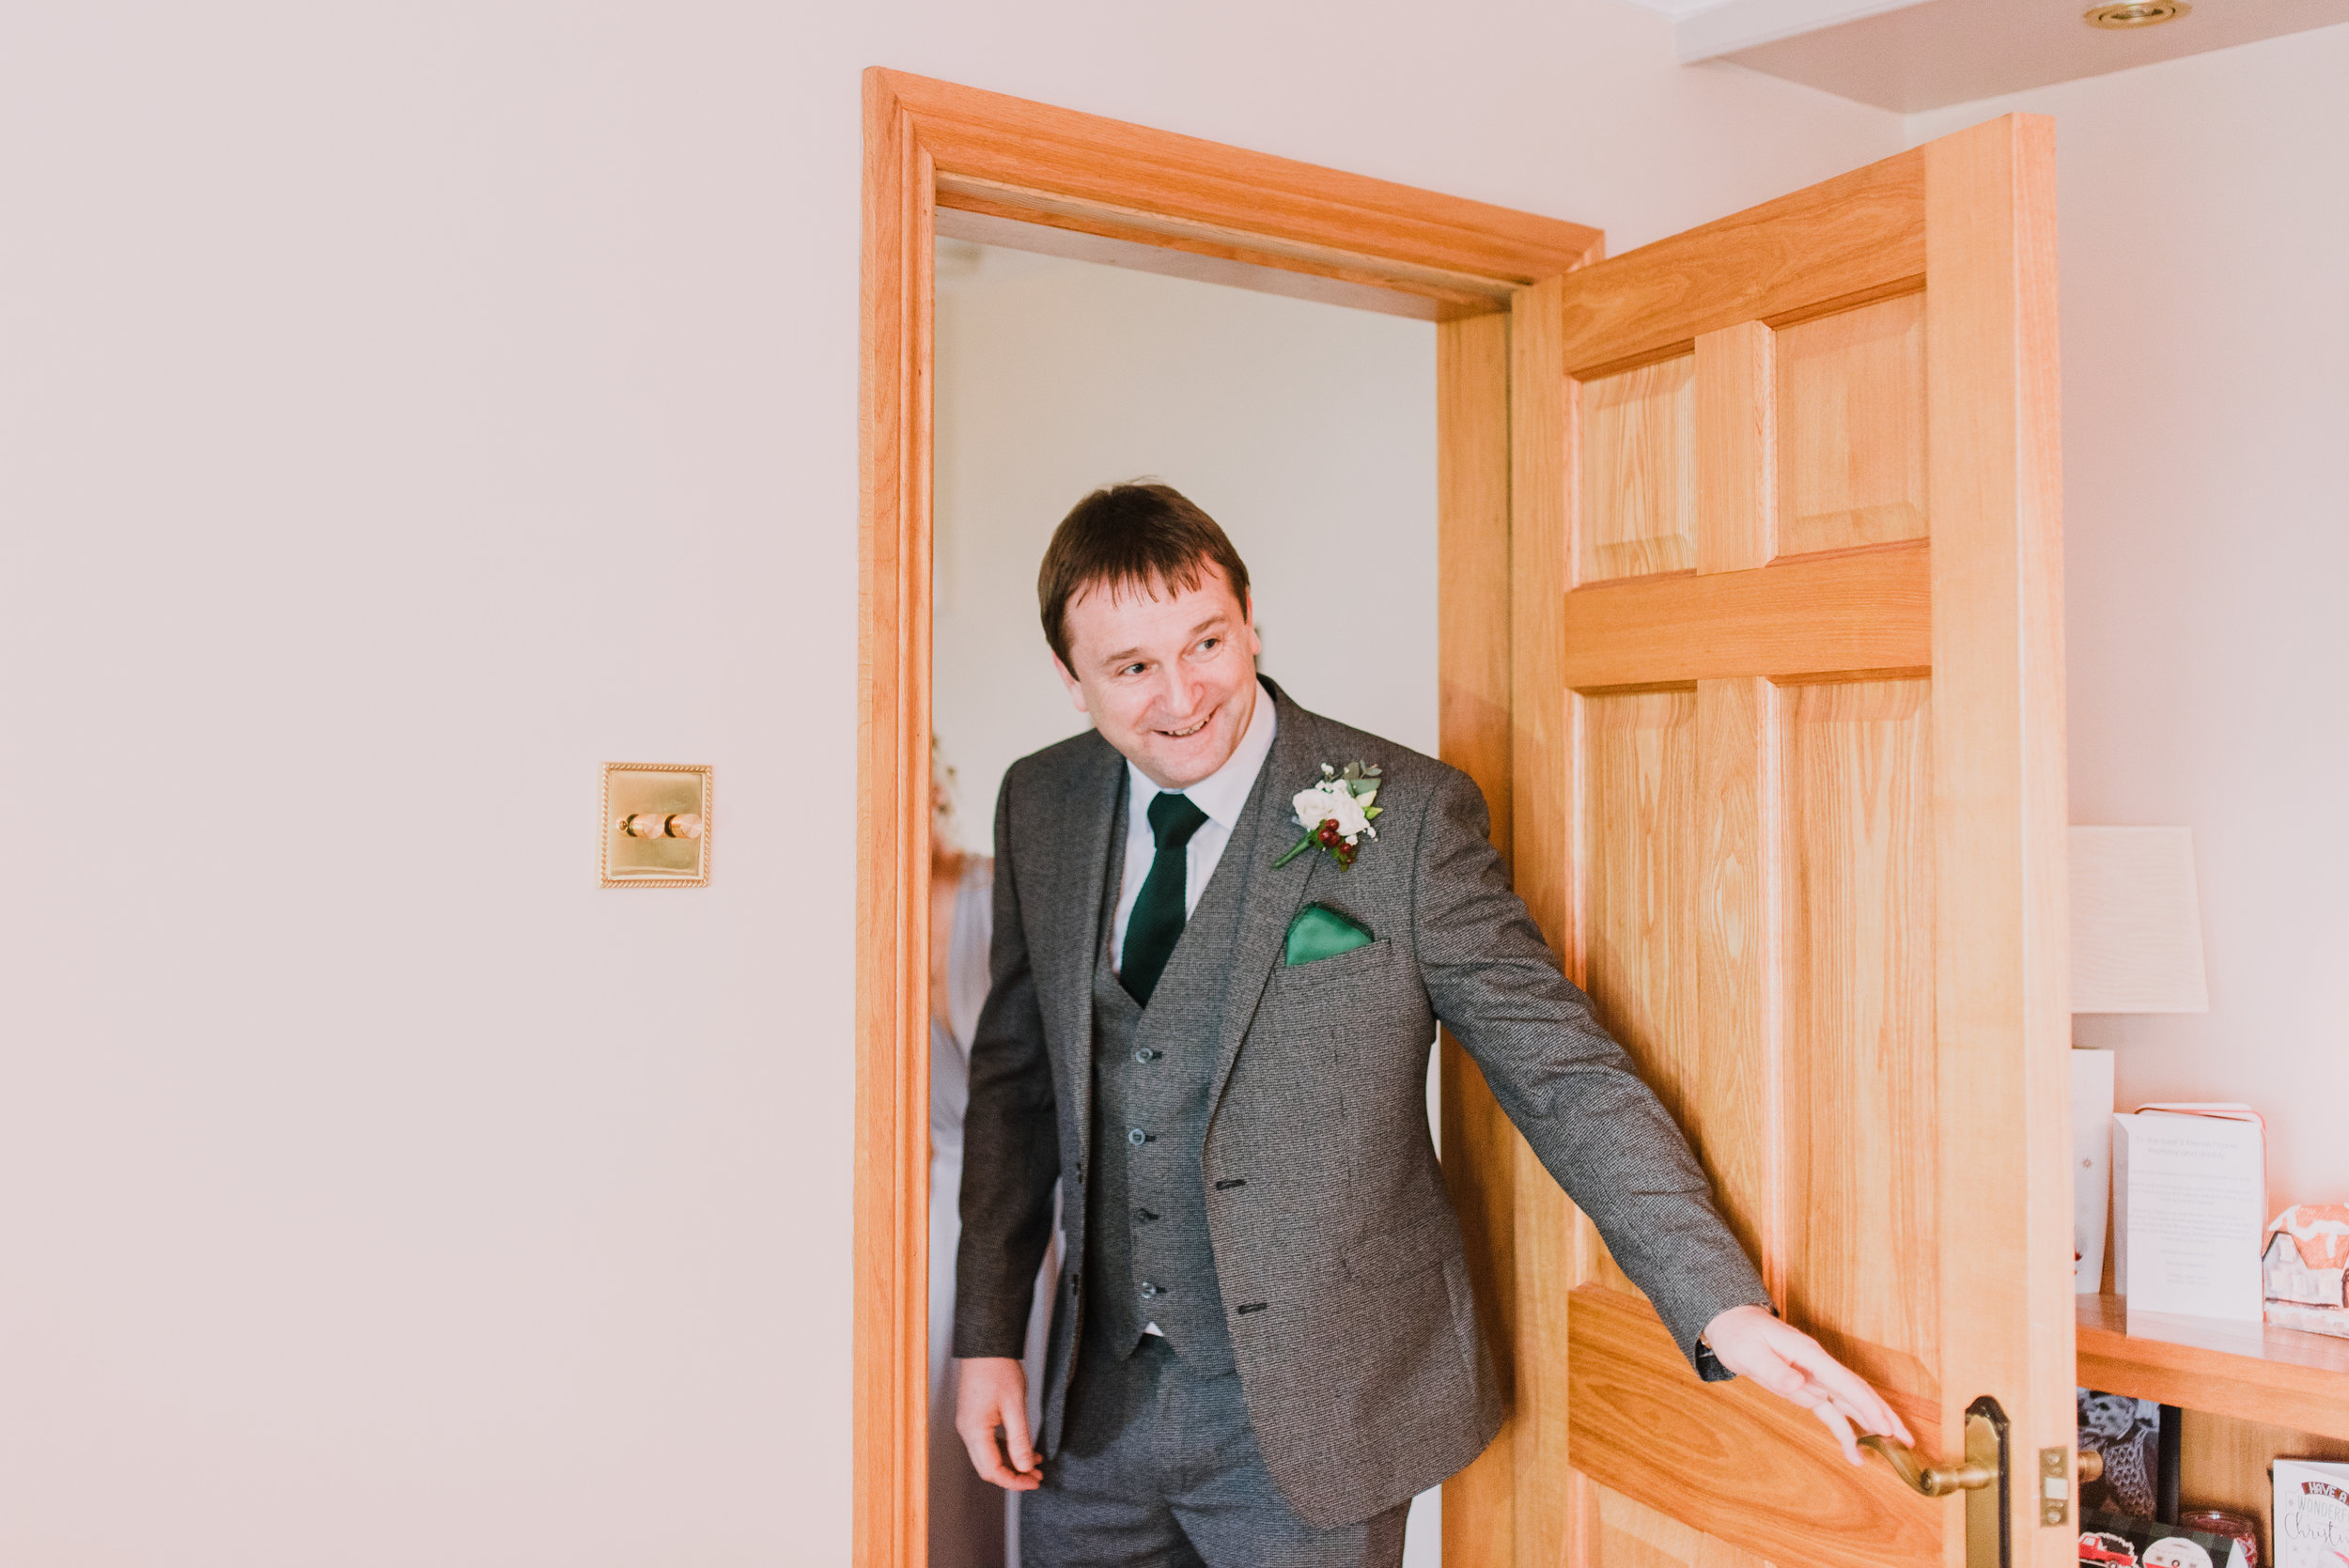 larchfield estate wedding, wedding venues northern ireland, barn wedding venues northern ireland, quirky weddings northern ireland, 5 star wedding venues northern ireland, wedding getting ready (24).jpg